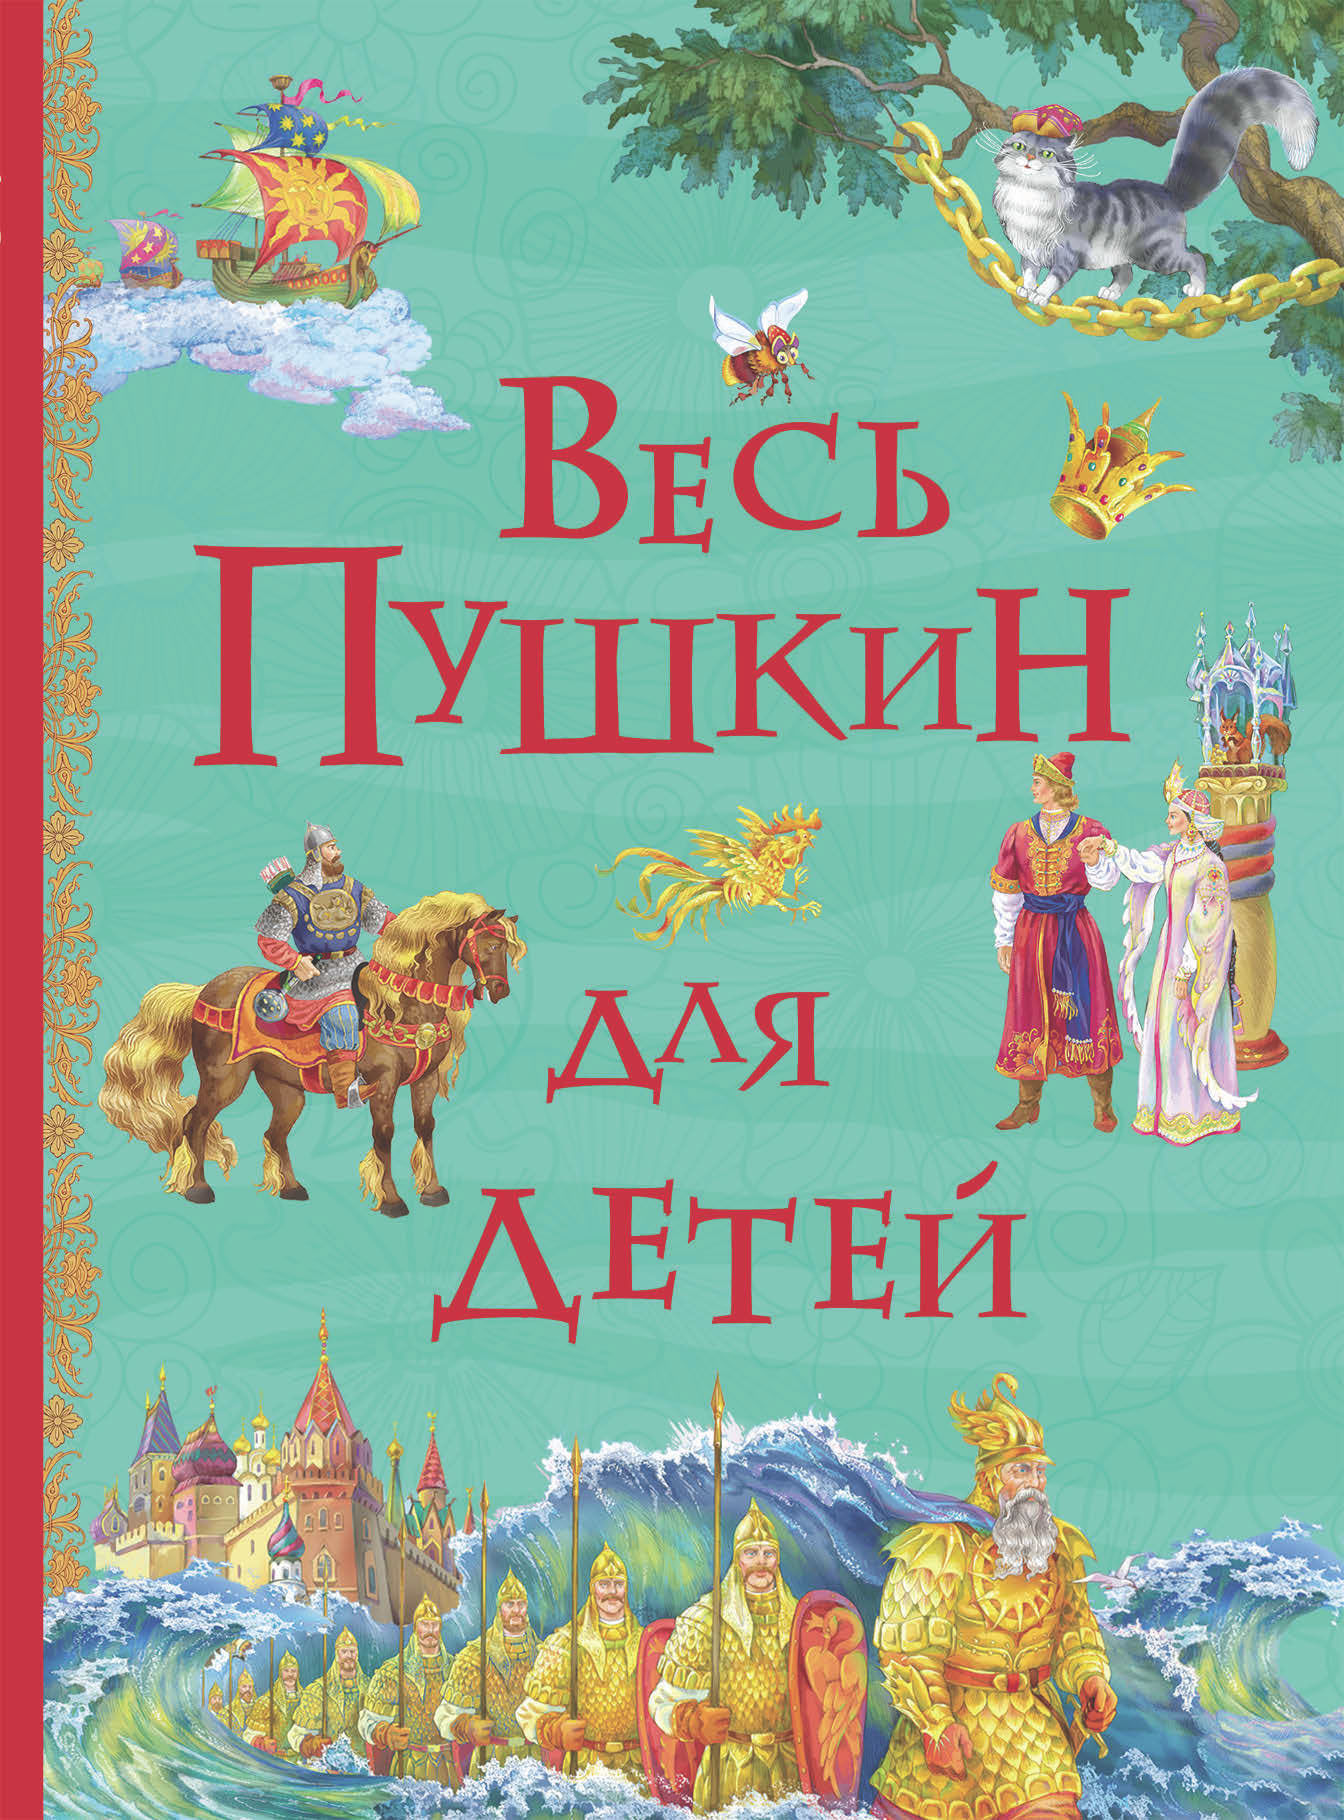 Александр Пушкин - Весь Пушкин для детей (сборник)